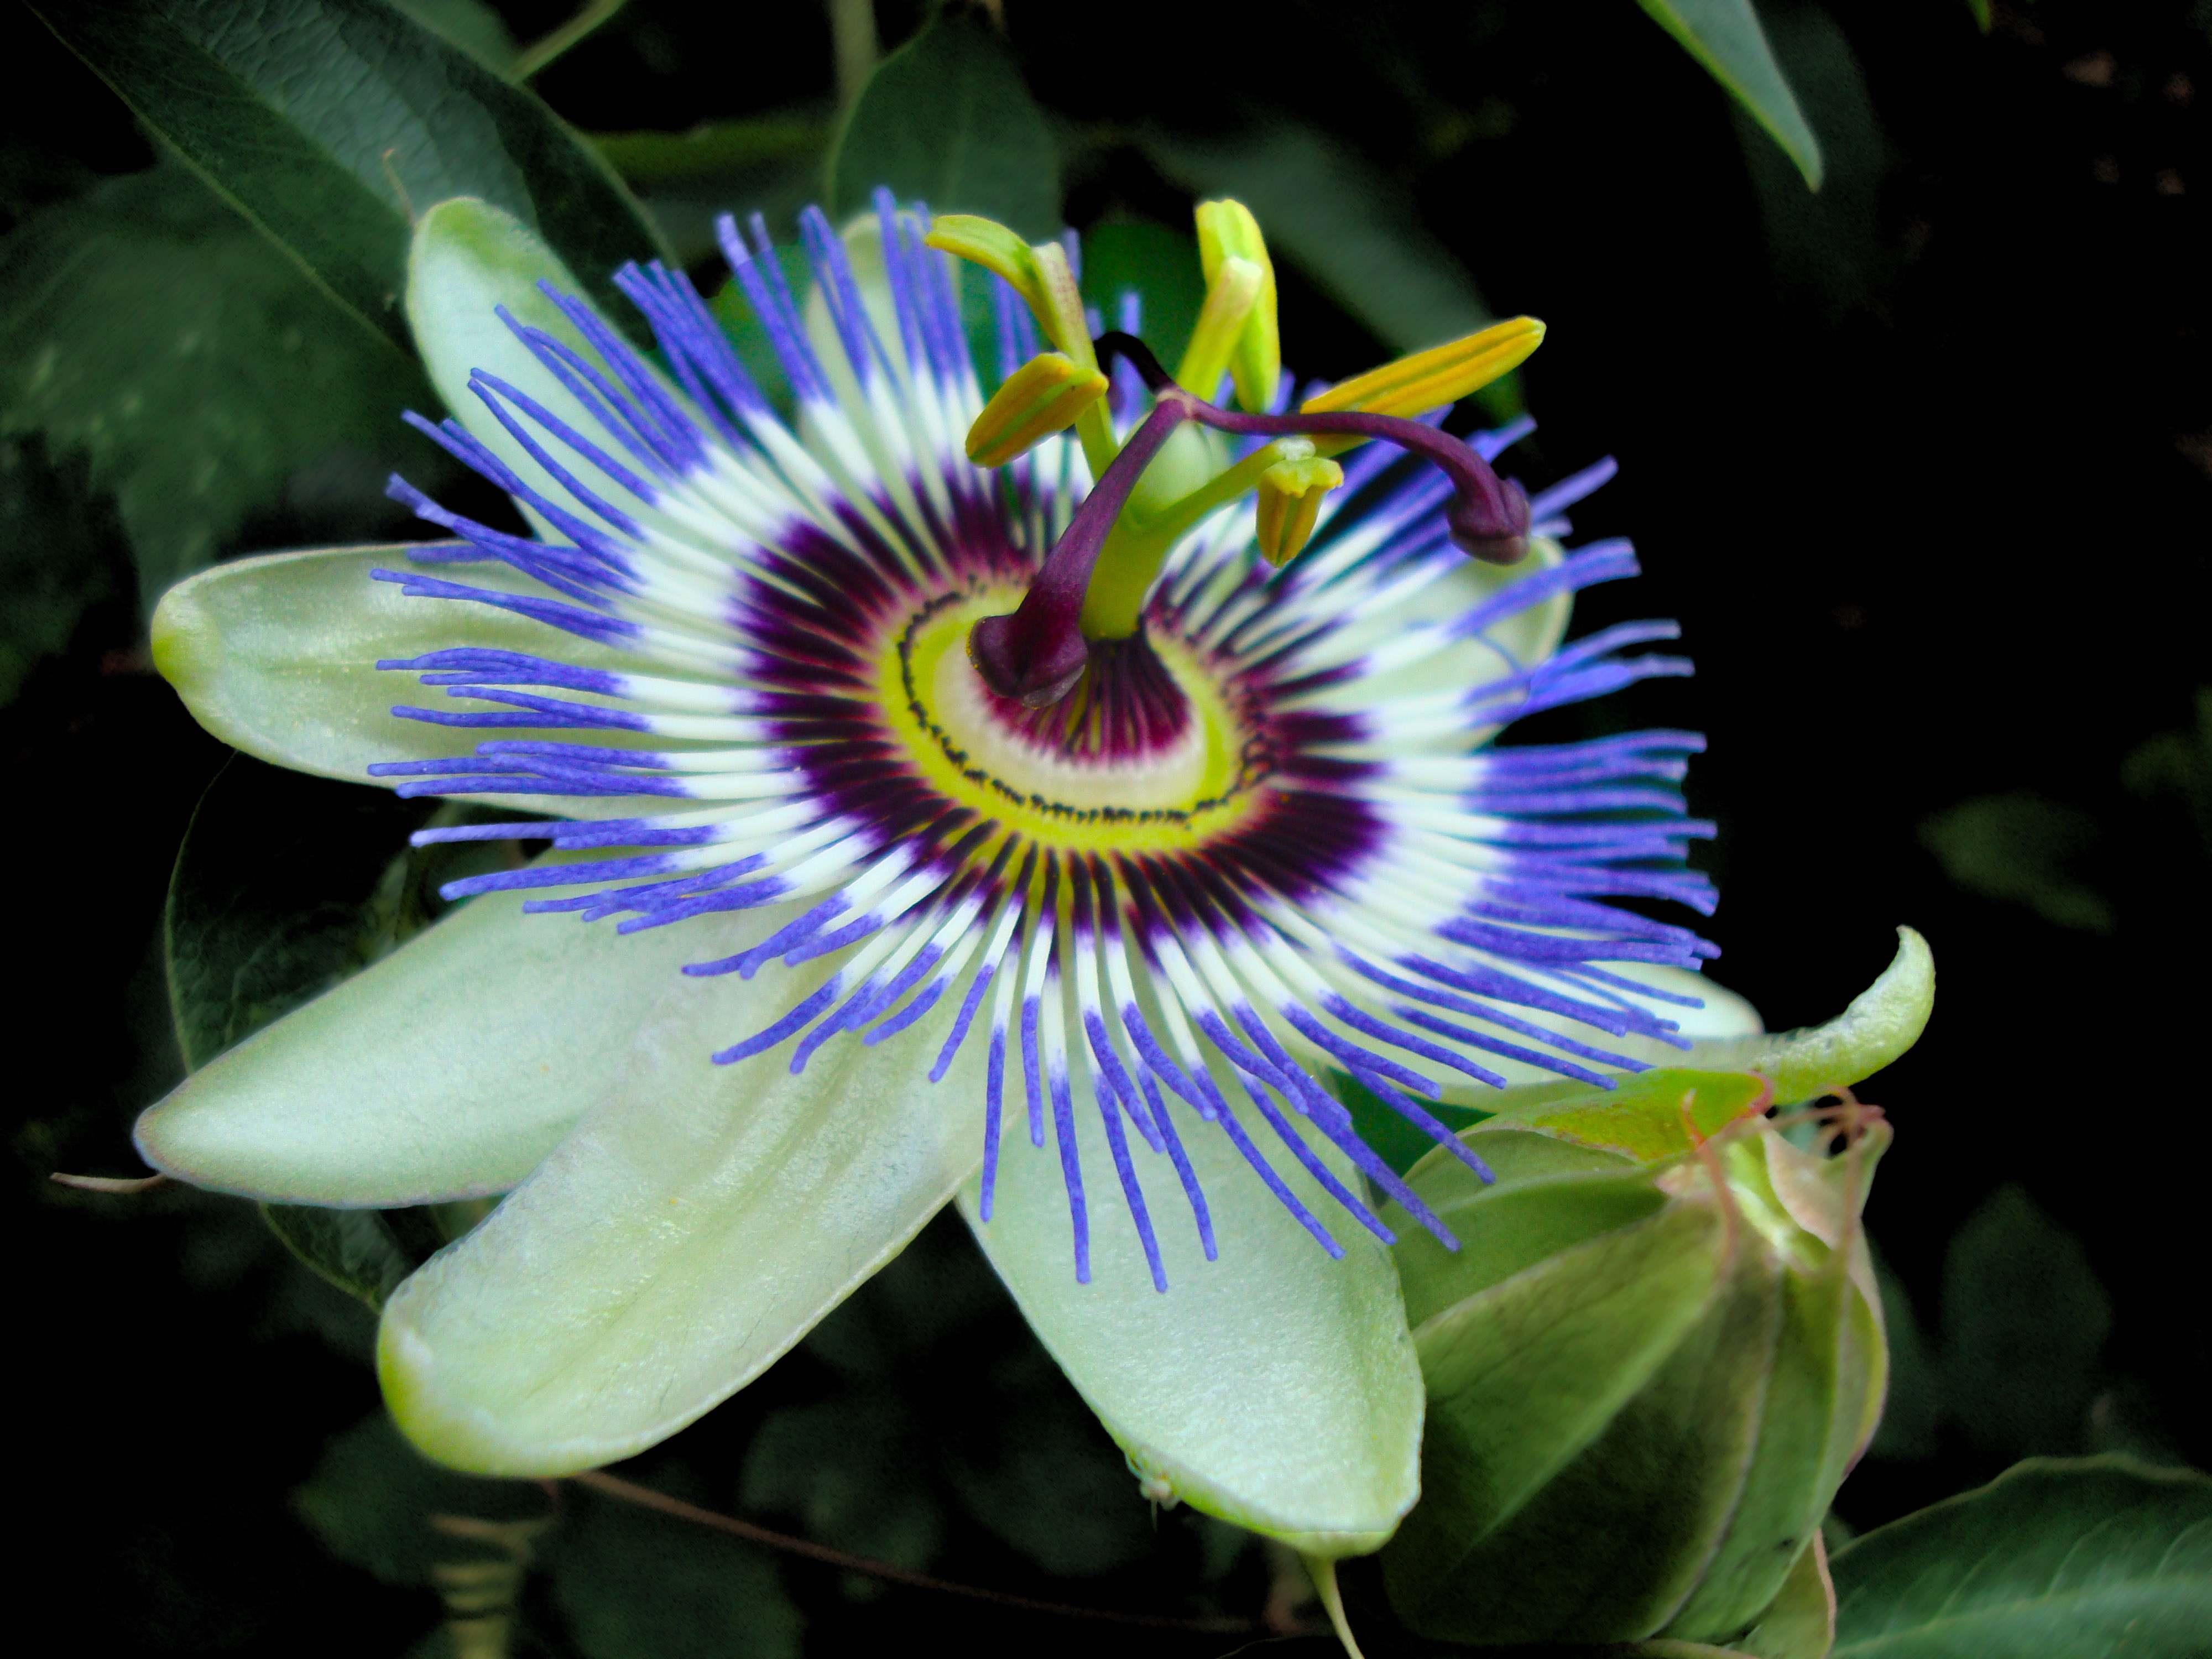 Passion Fruit Flower Images Hd